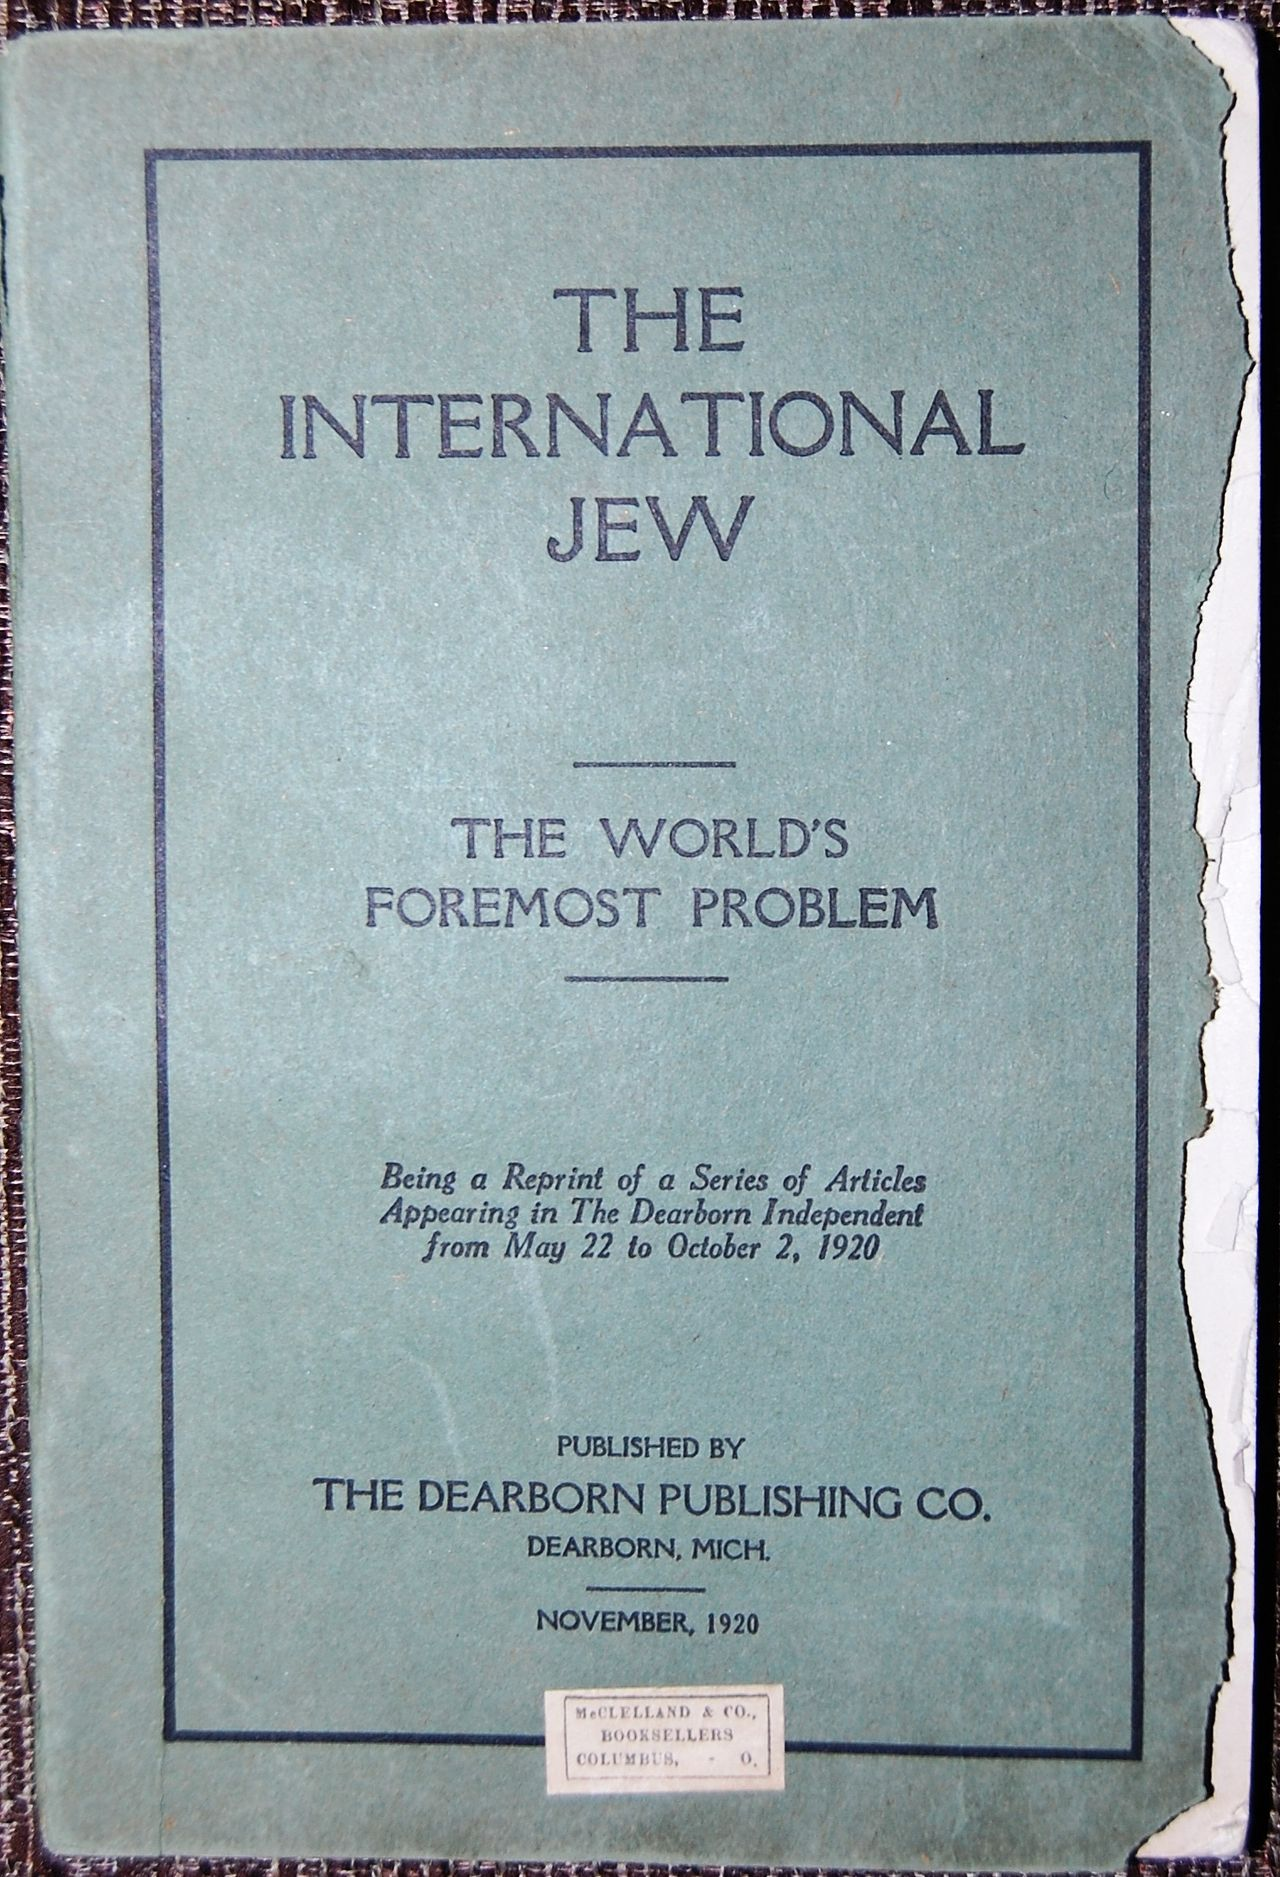 1280px-The_International_Jew,_Nov._1920_